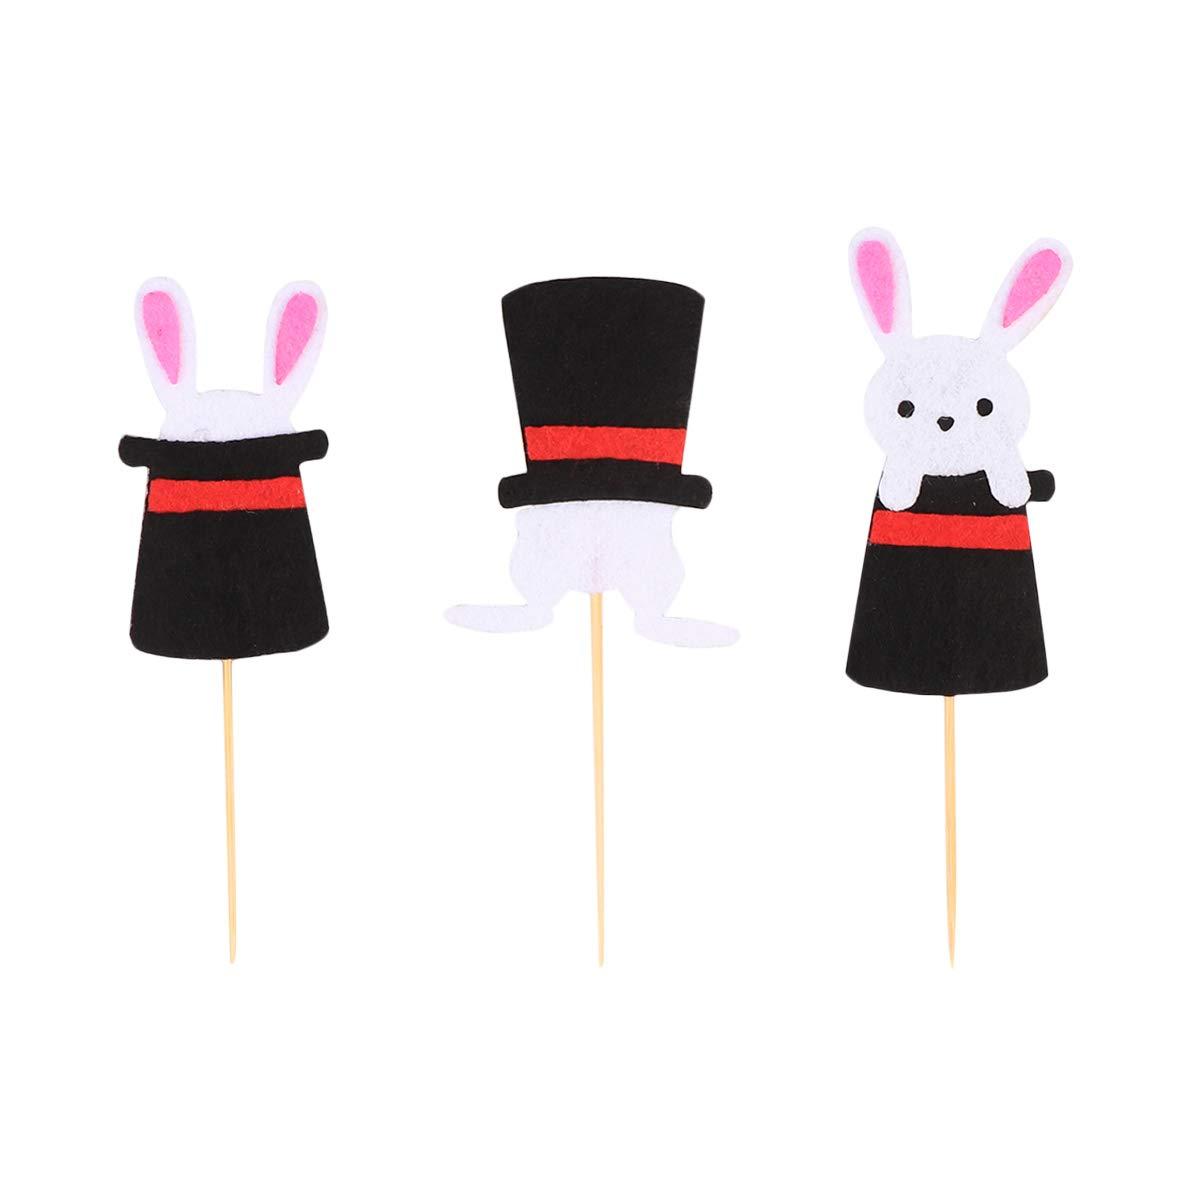 Amosfun 24 Unids/Set Easter Bunny Rabbit Magic Hat Cake Toppers Cupcake Decorating Supplies Fiesta de Cumpleaños de Pascua Favores